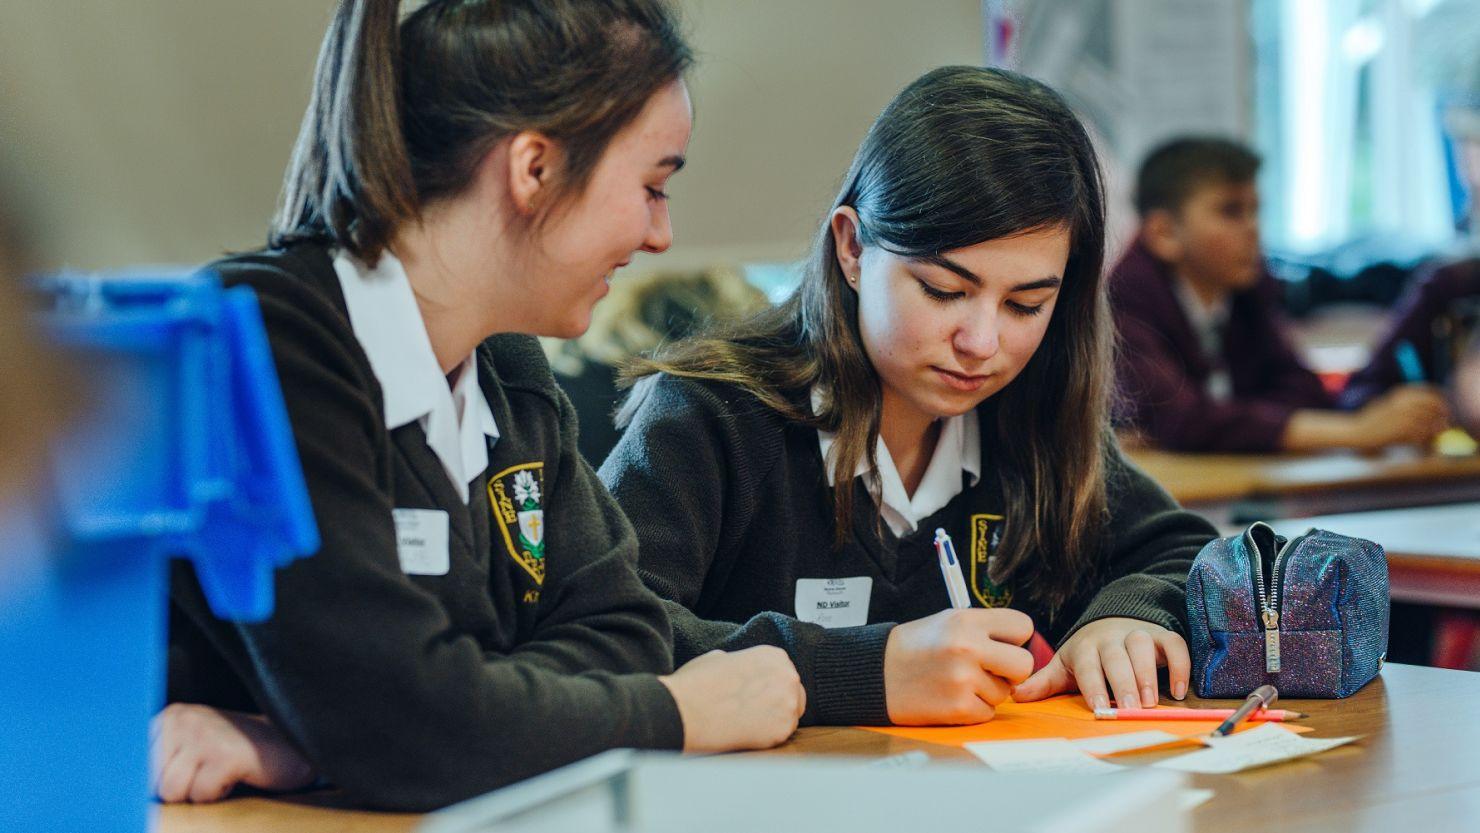 School girls taking part in a workshop in their classroom